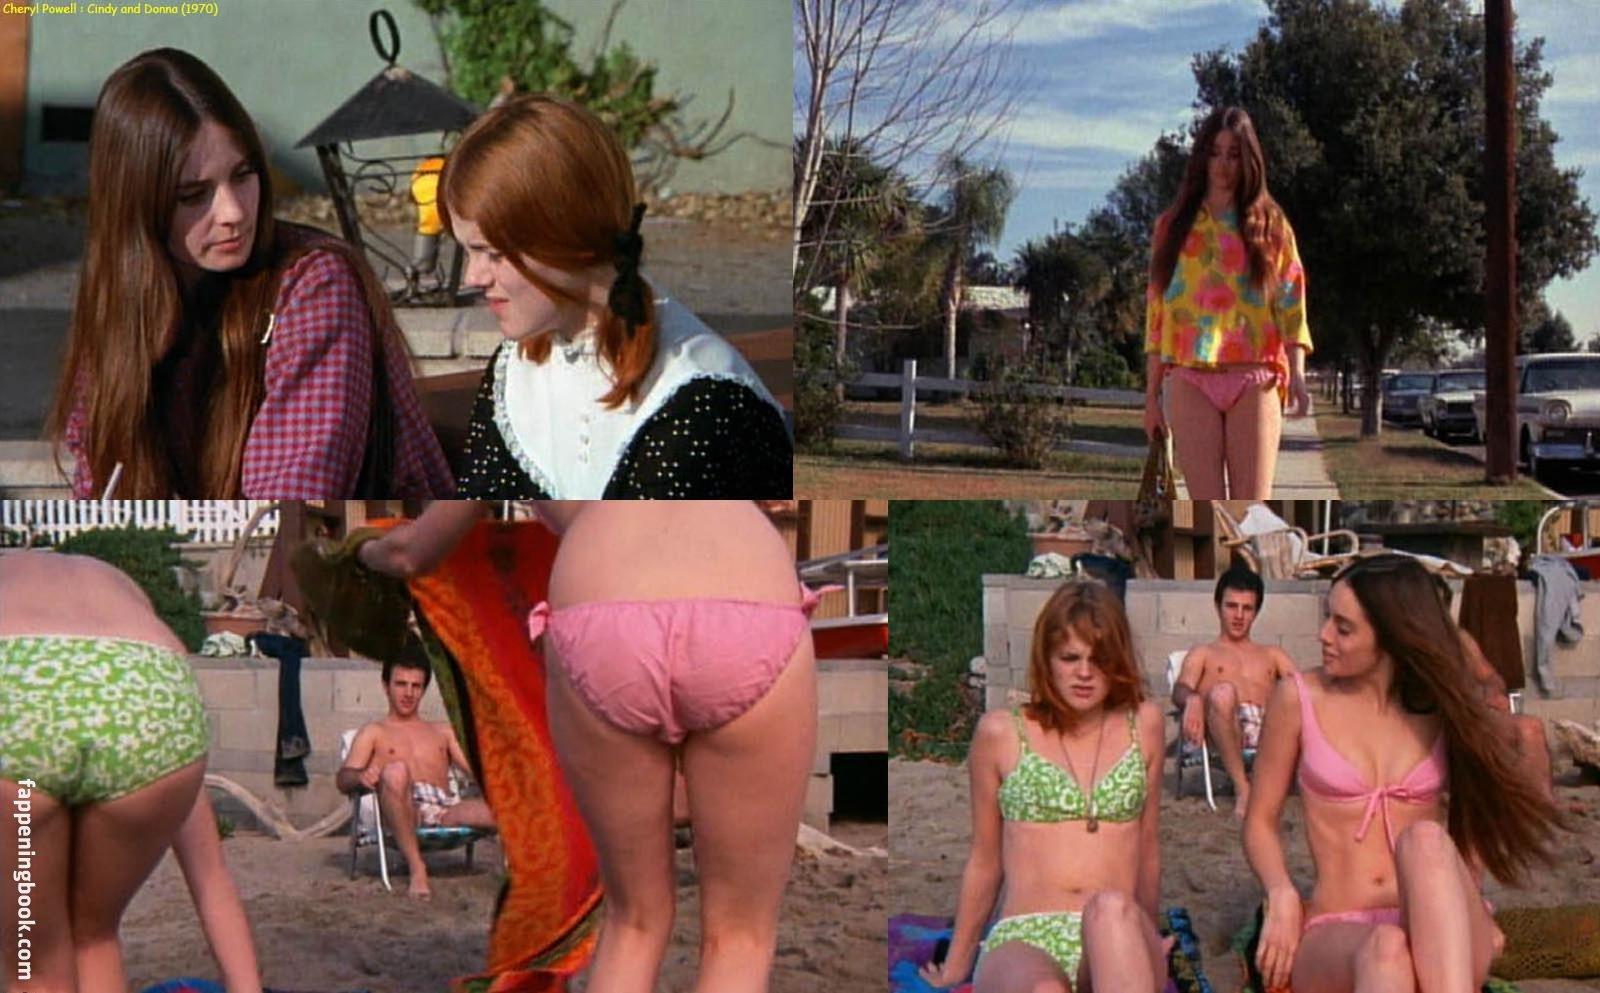 Cheryl Powell Nude